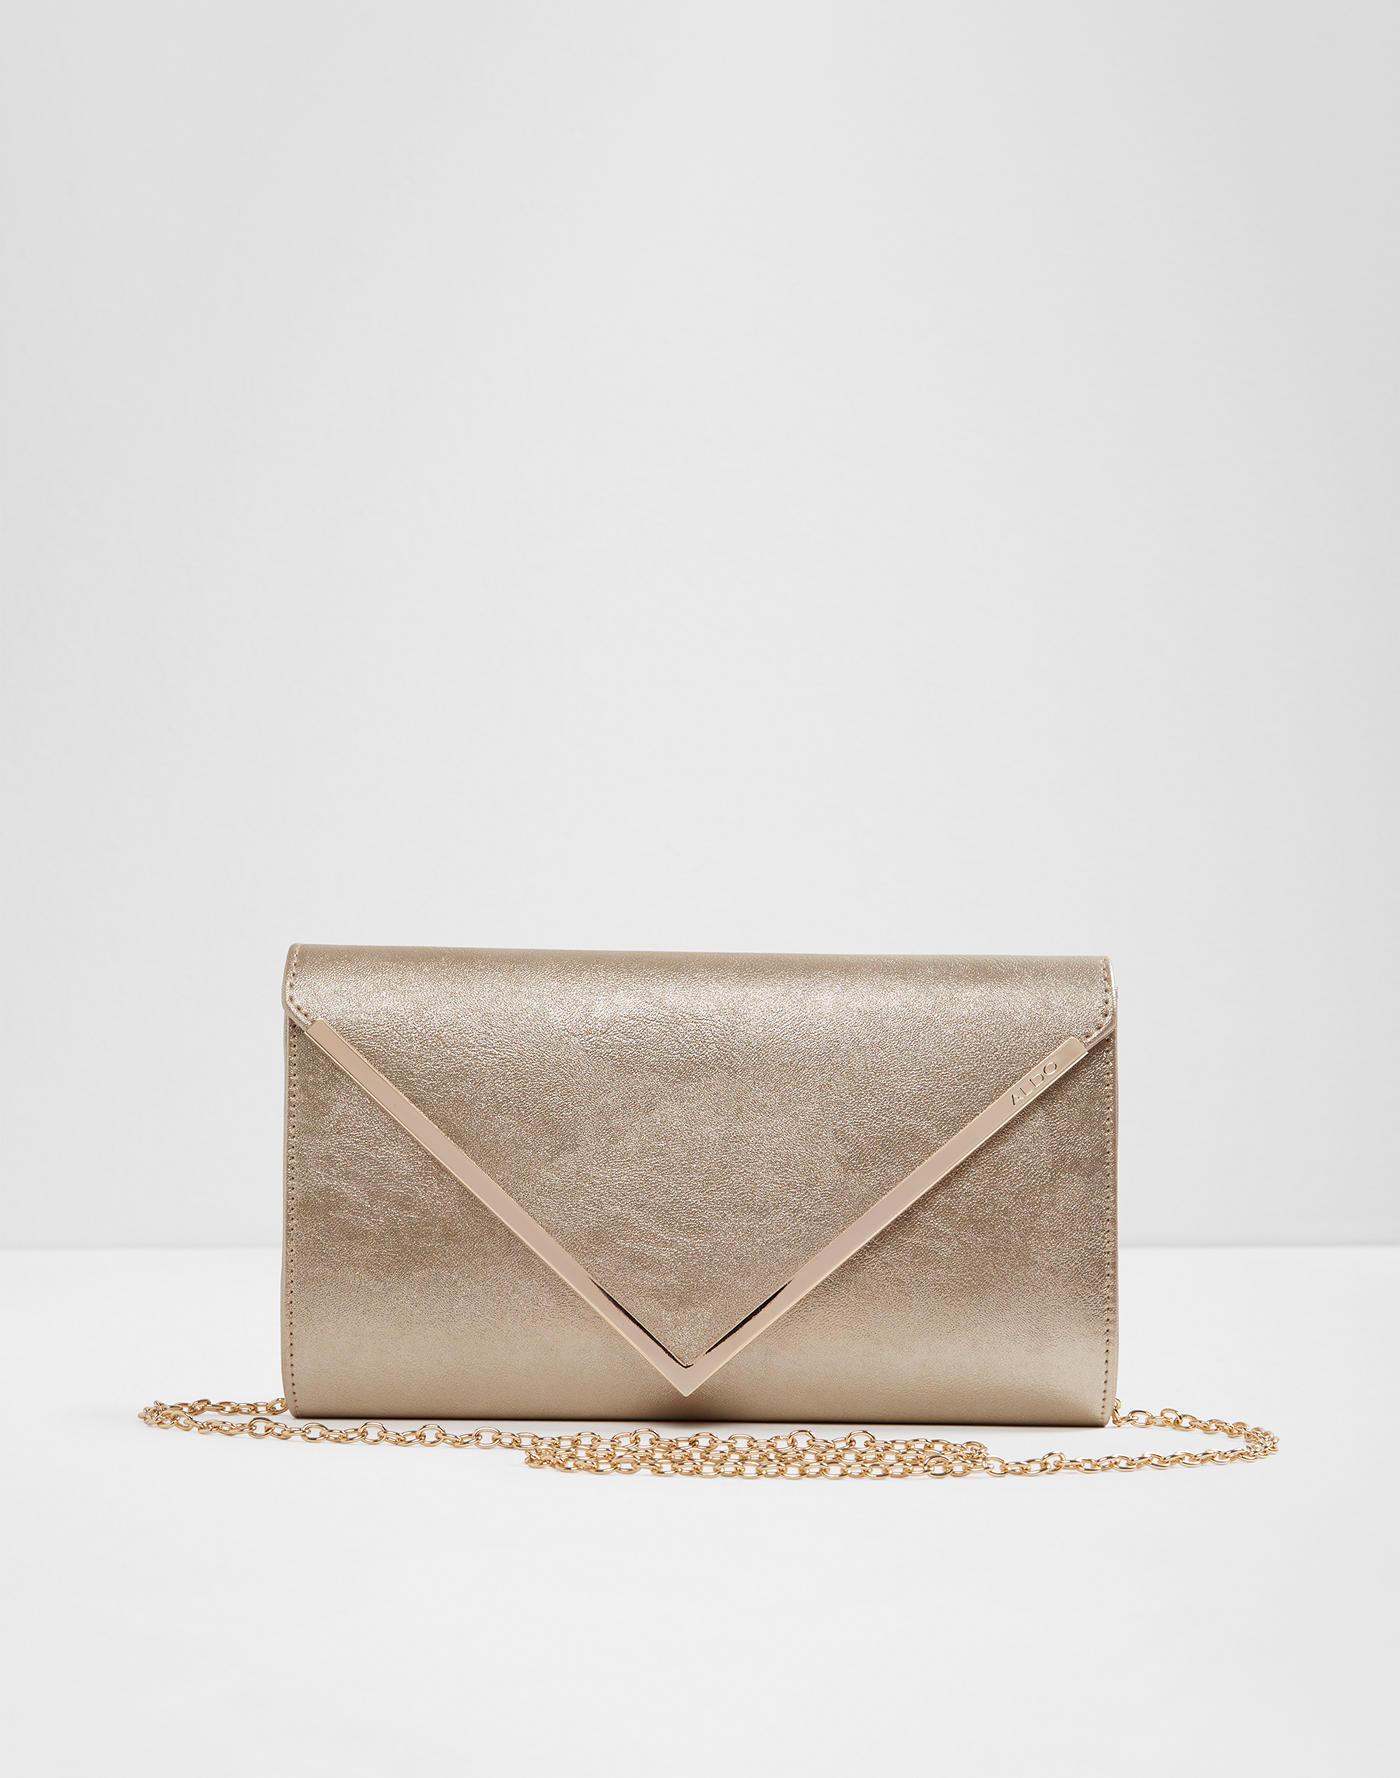 202332ef6530 Handbags